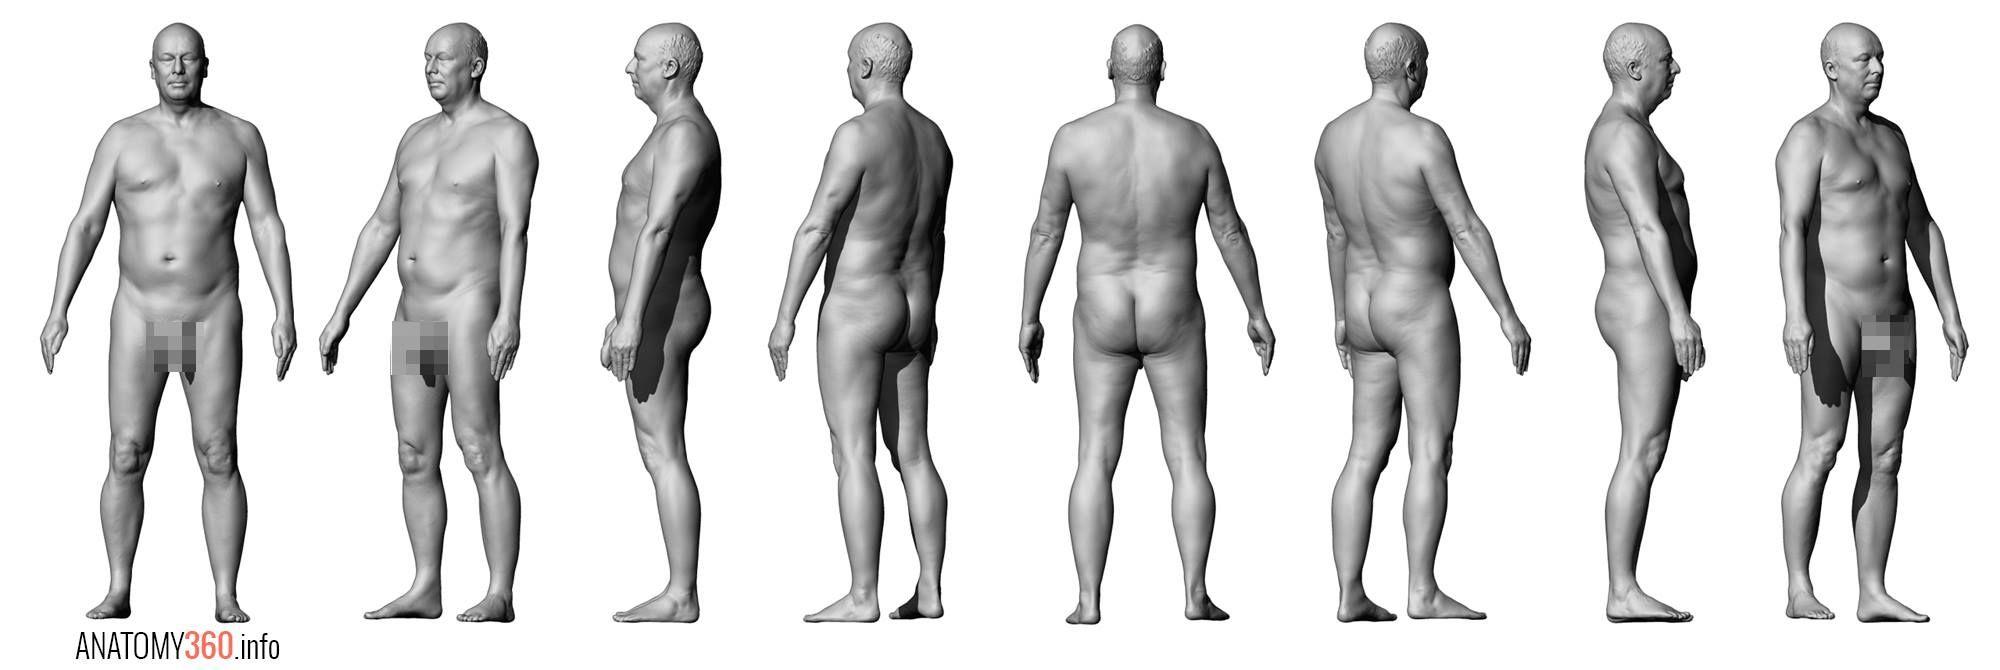 Pin by Damián Bonani on Art | 3D Model Anatomy360.info | Pinterest ...